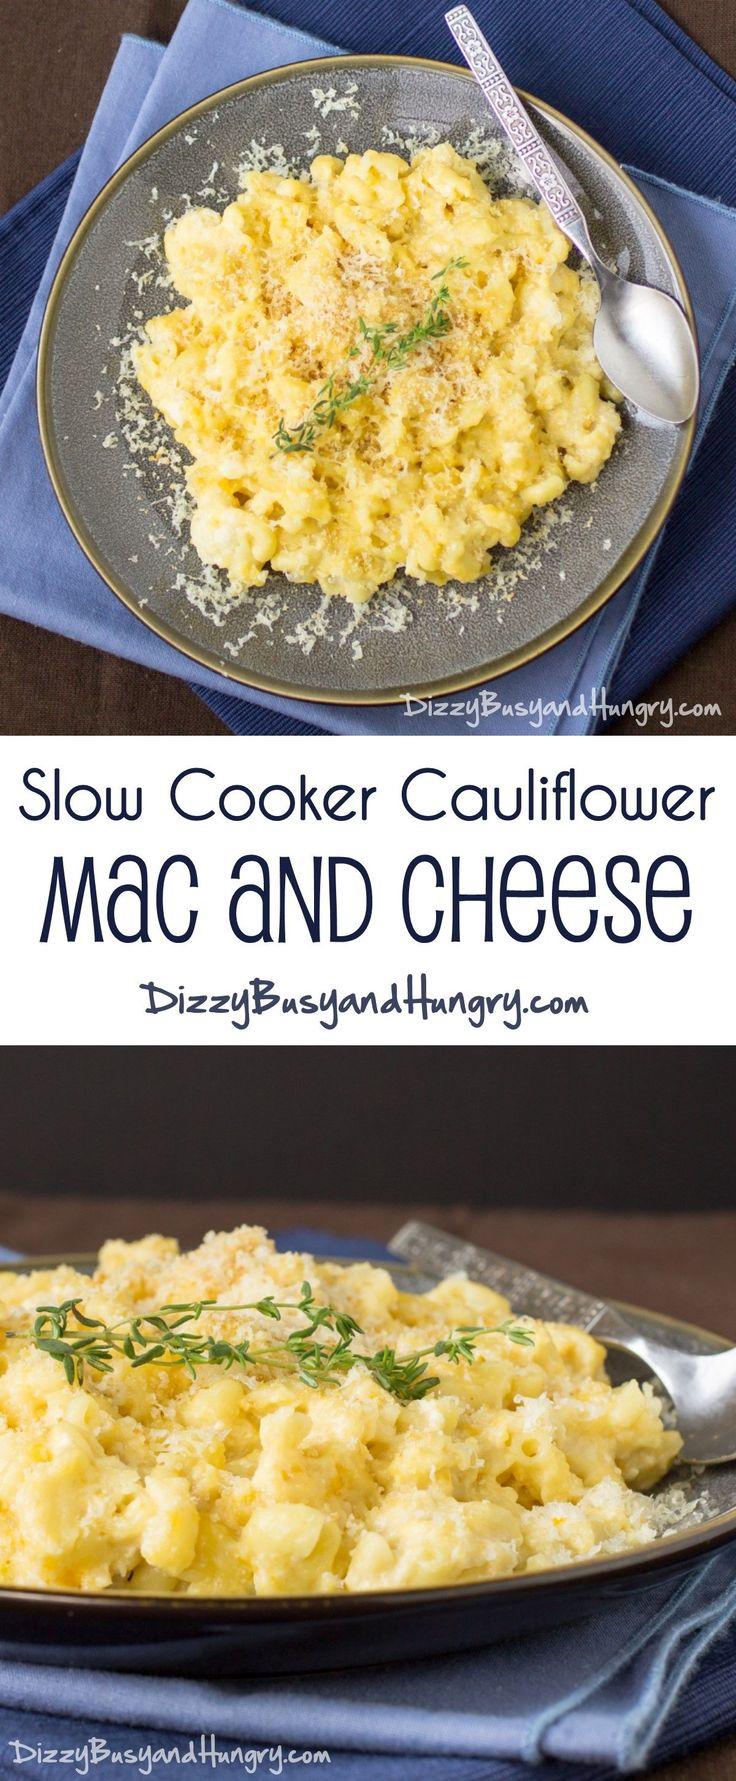 Slow Cooker Cauliflower Mac and Cheese - Kids love the taste, moms ...